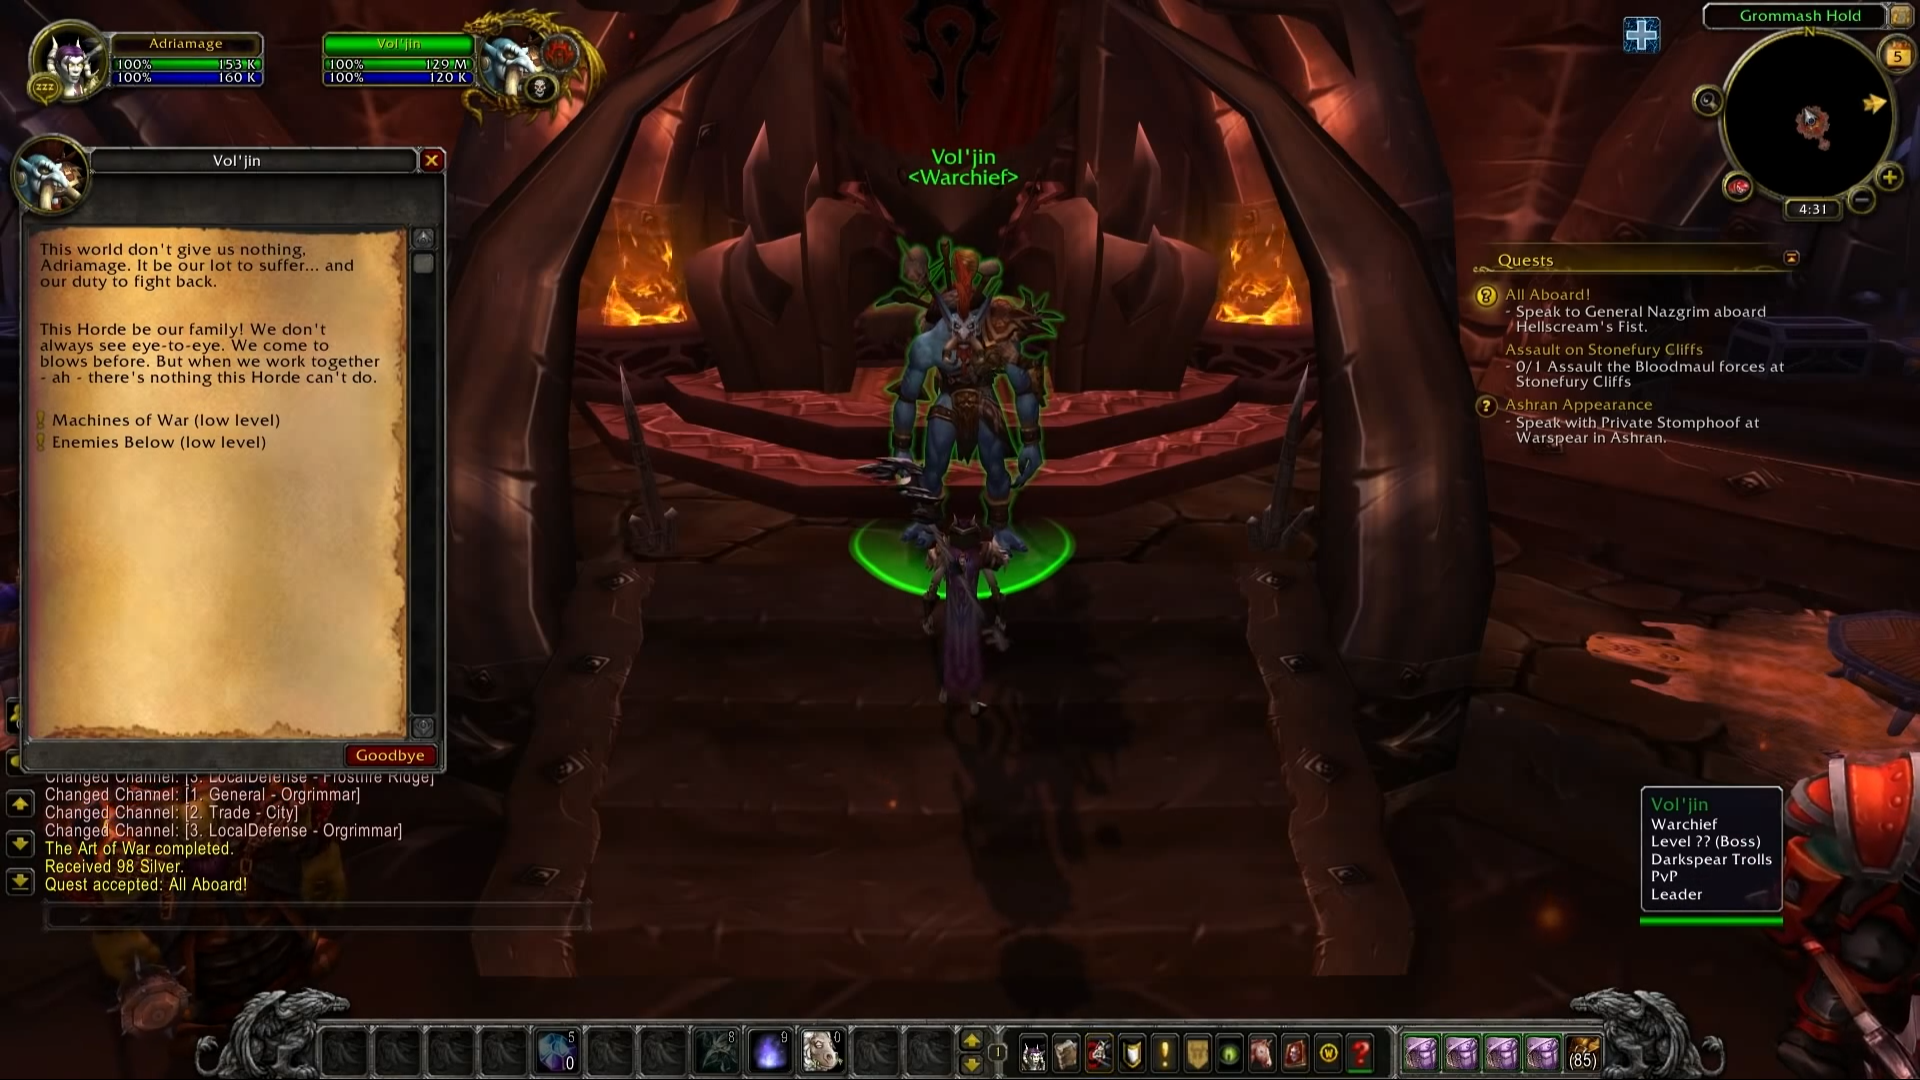 Warchief Voljin Warlords Of Draenor Beta World Of Warcraft